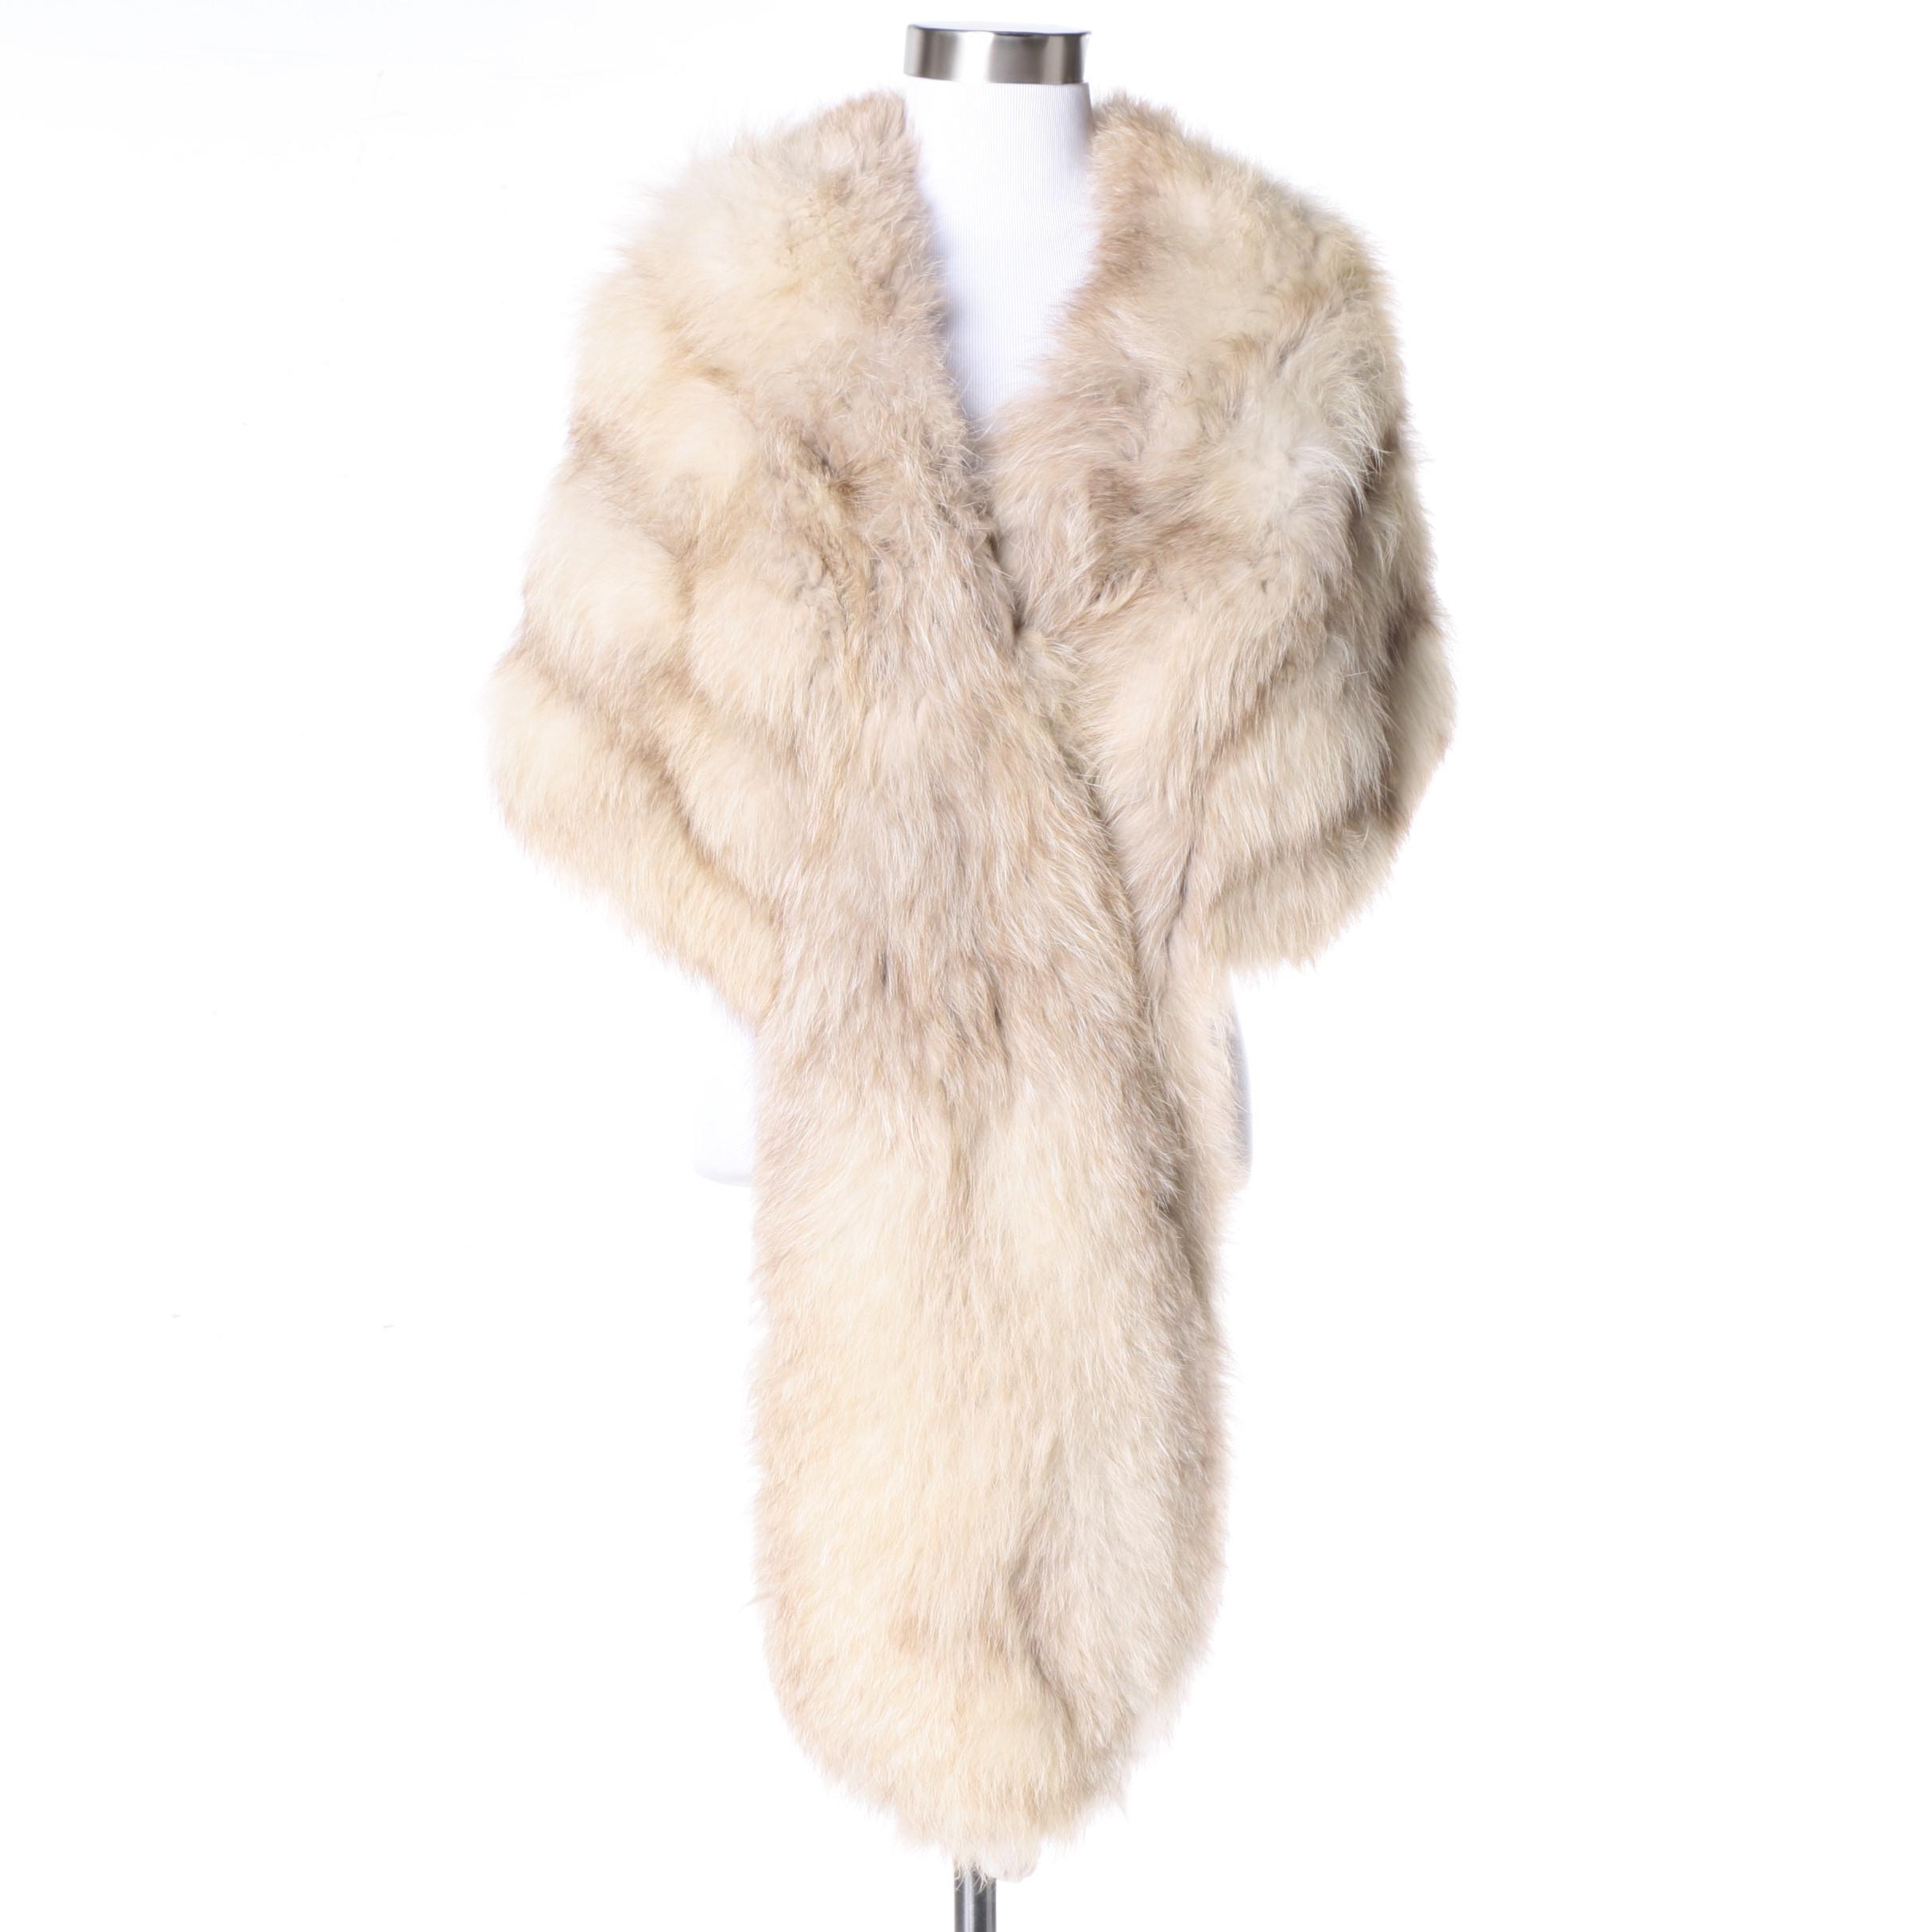 Vintage Fox Fur Stole